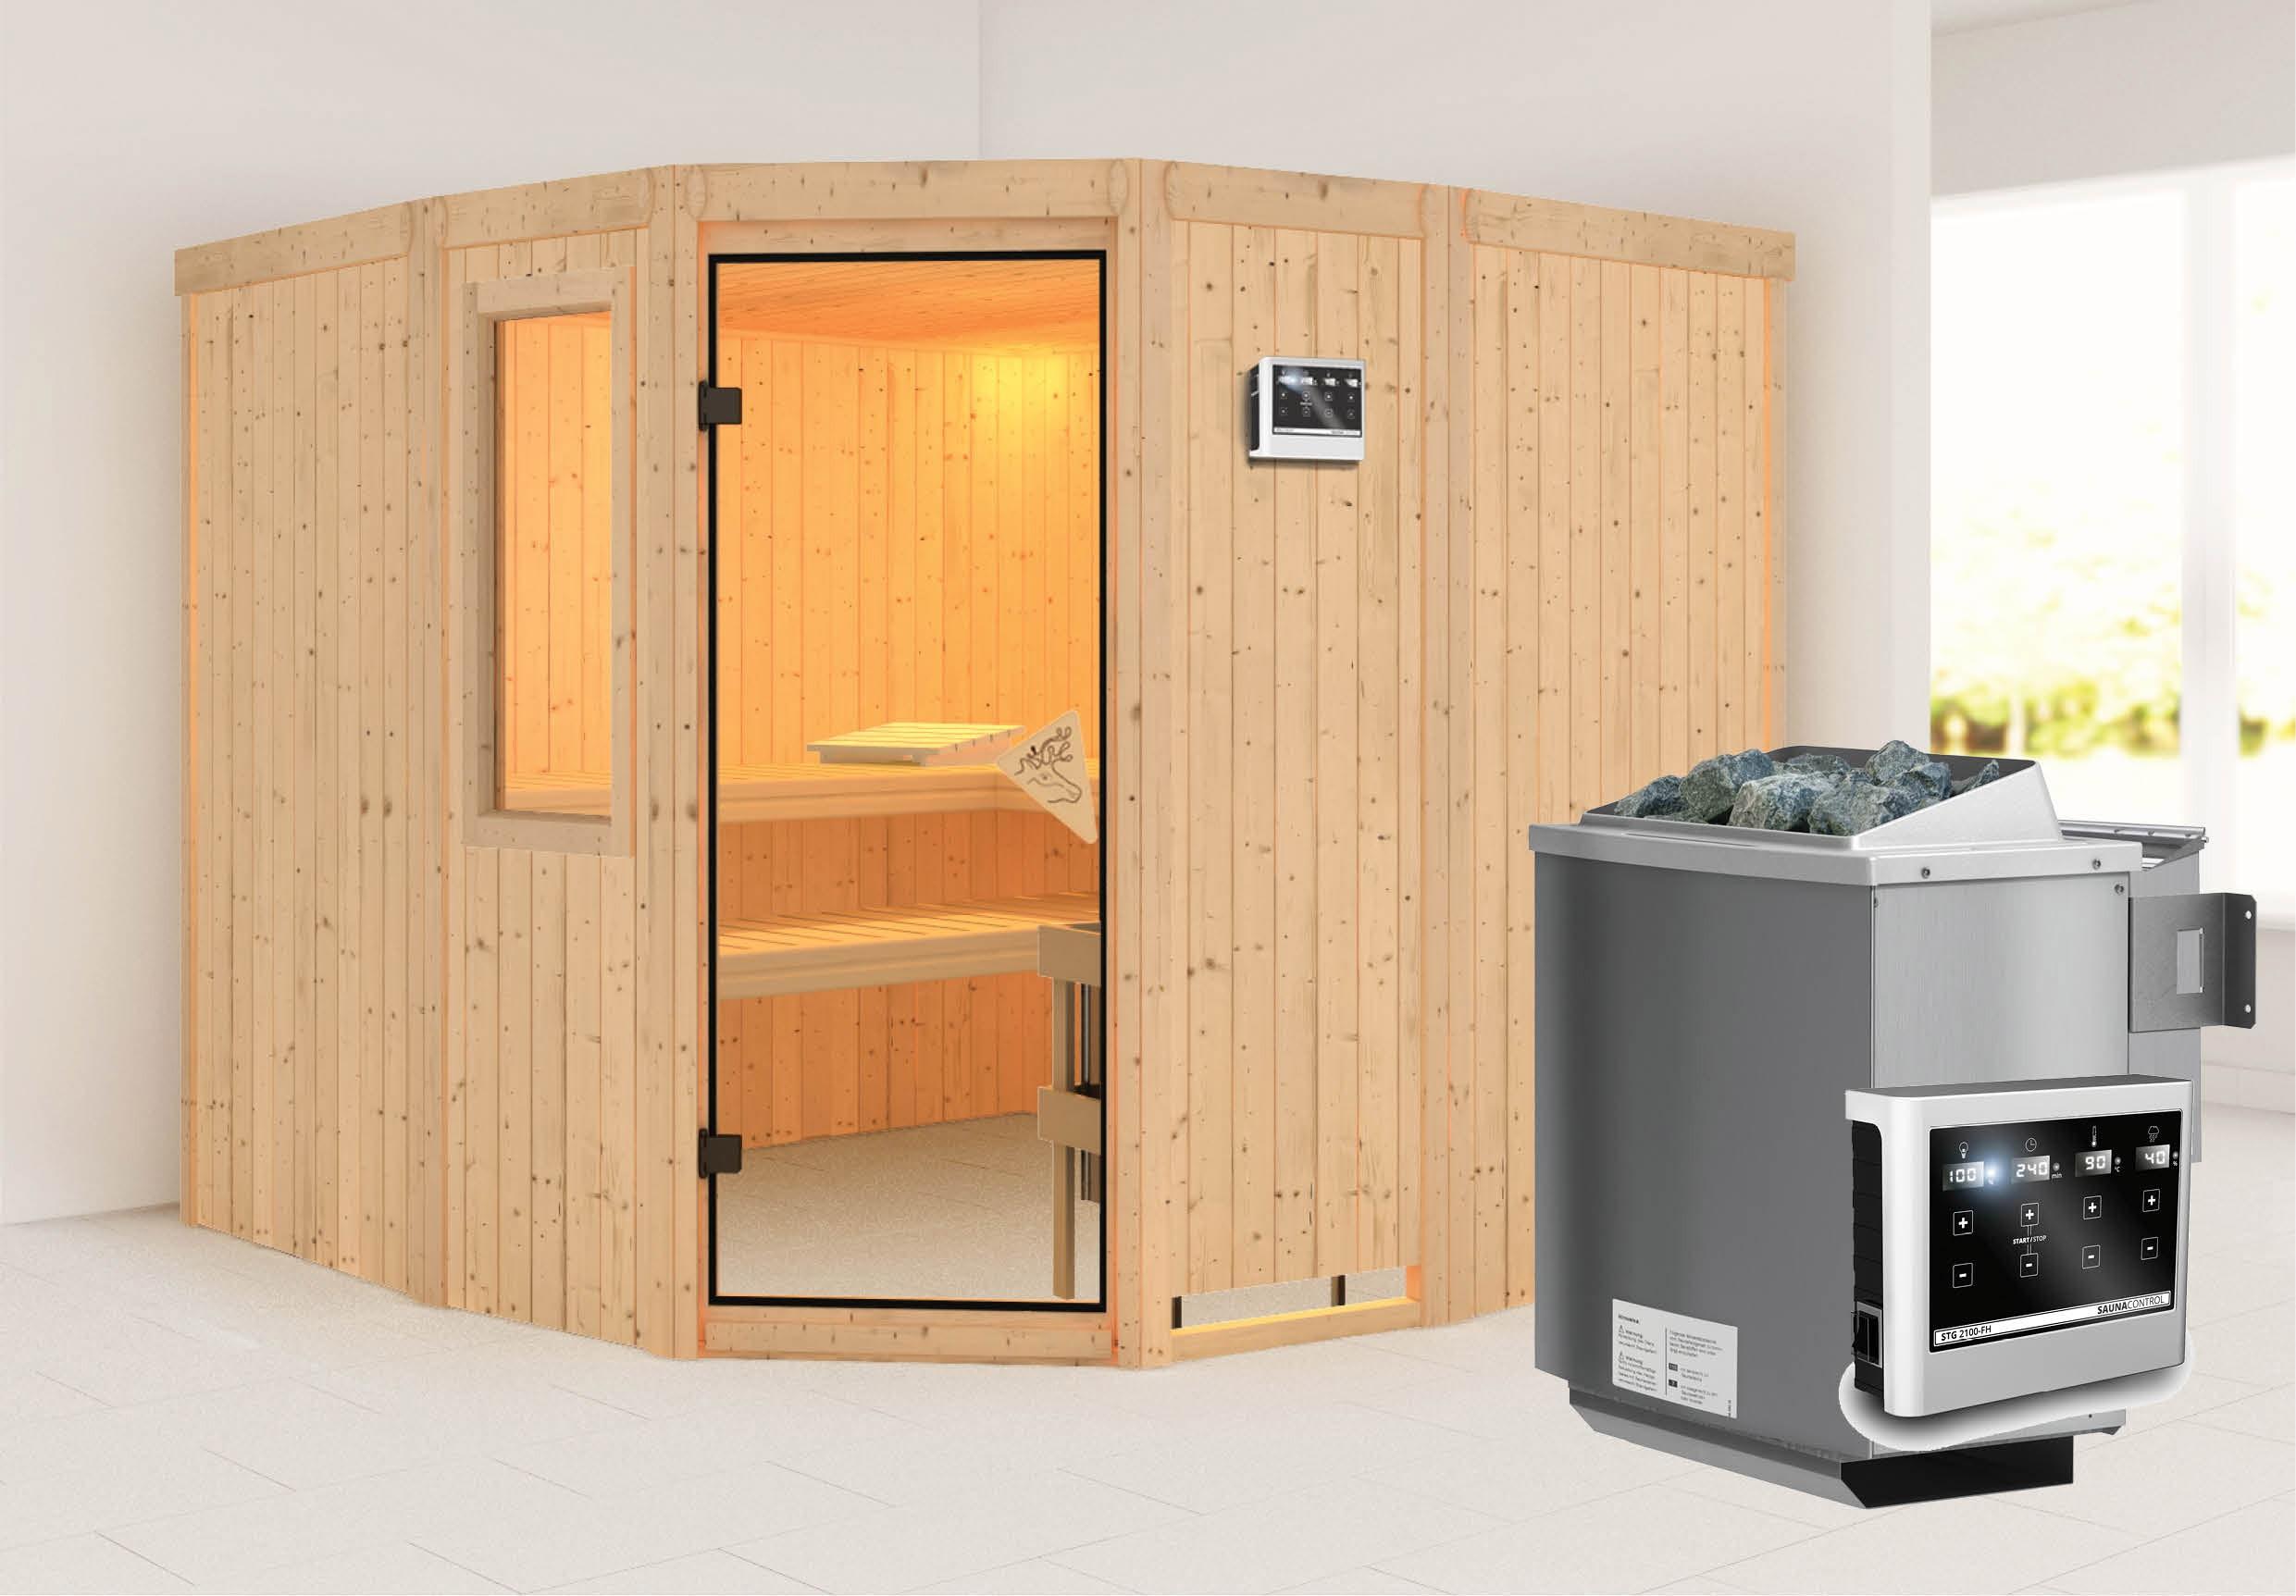 Karibu Sauna Simara3 68mm Fenster + Bio Ofen 9kW extern classic Tür Bild 1